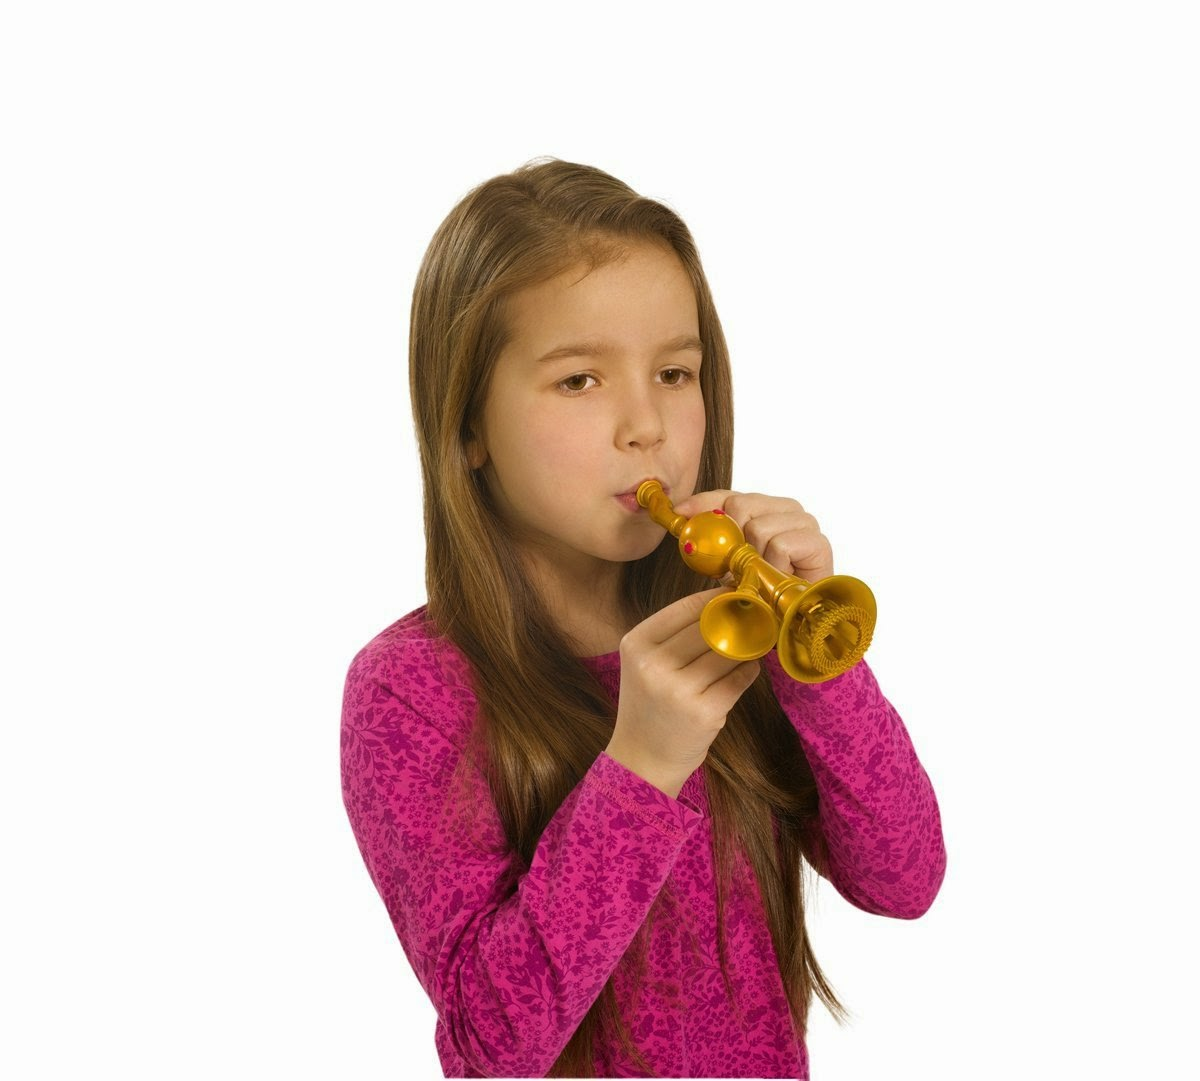 TOYS - Trompeta del fauno Phuddle - Pompas de Jabón : Mia And Me  Juguete oficial | Bubble Trumptus | Simba | A partir de 3 años